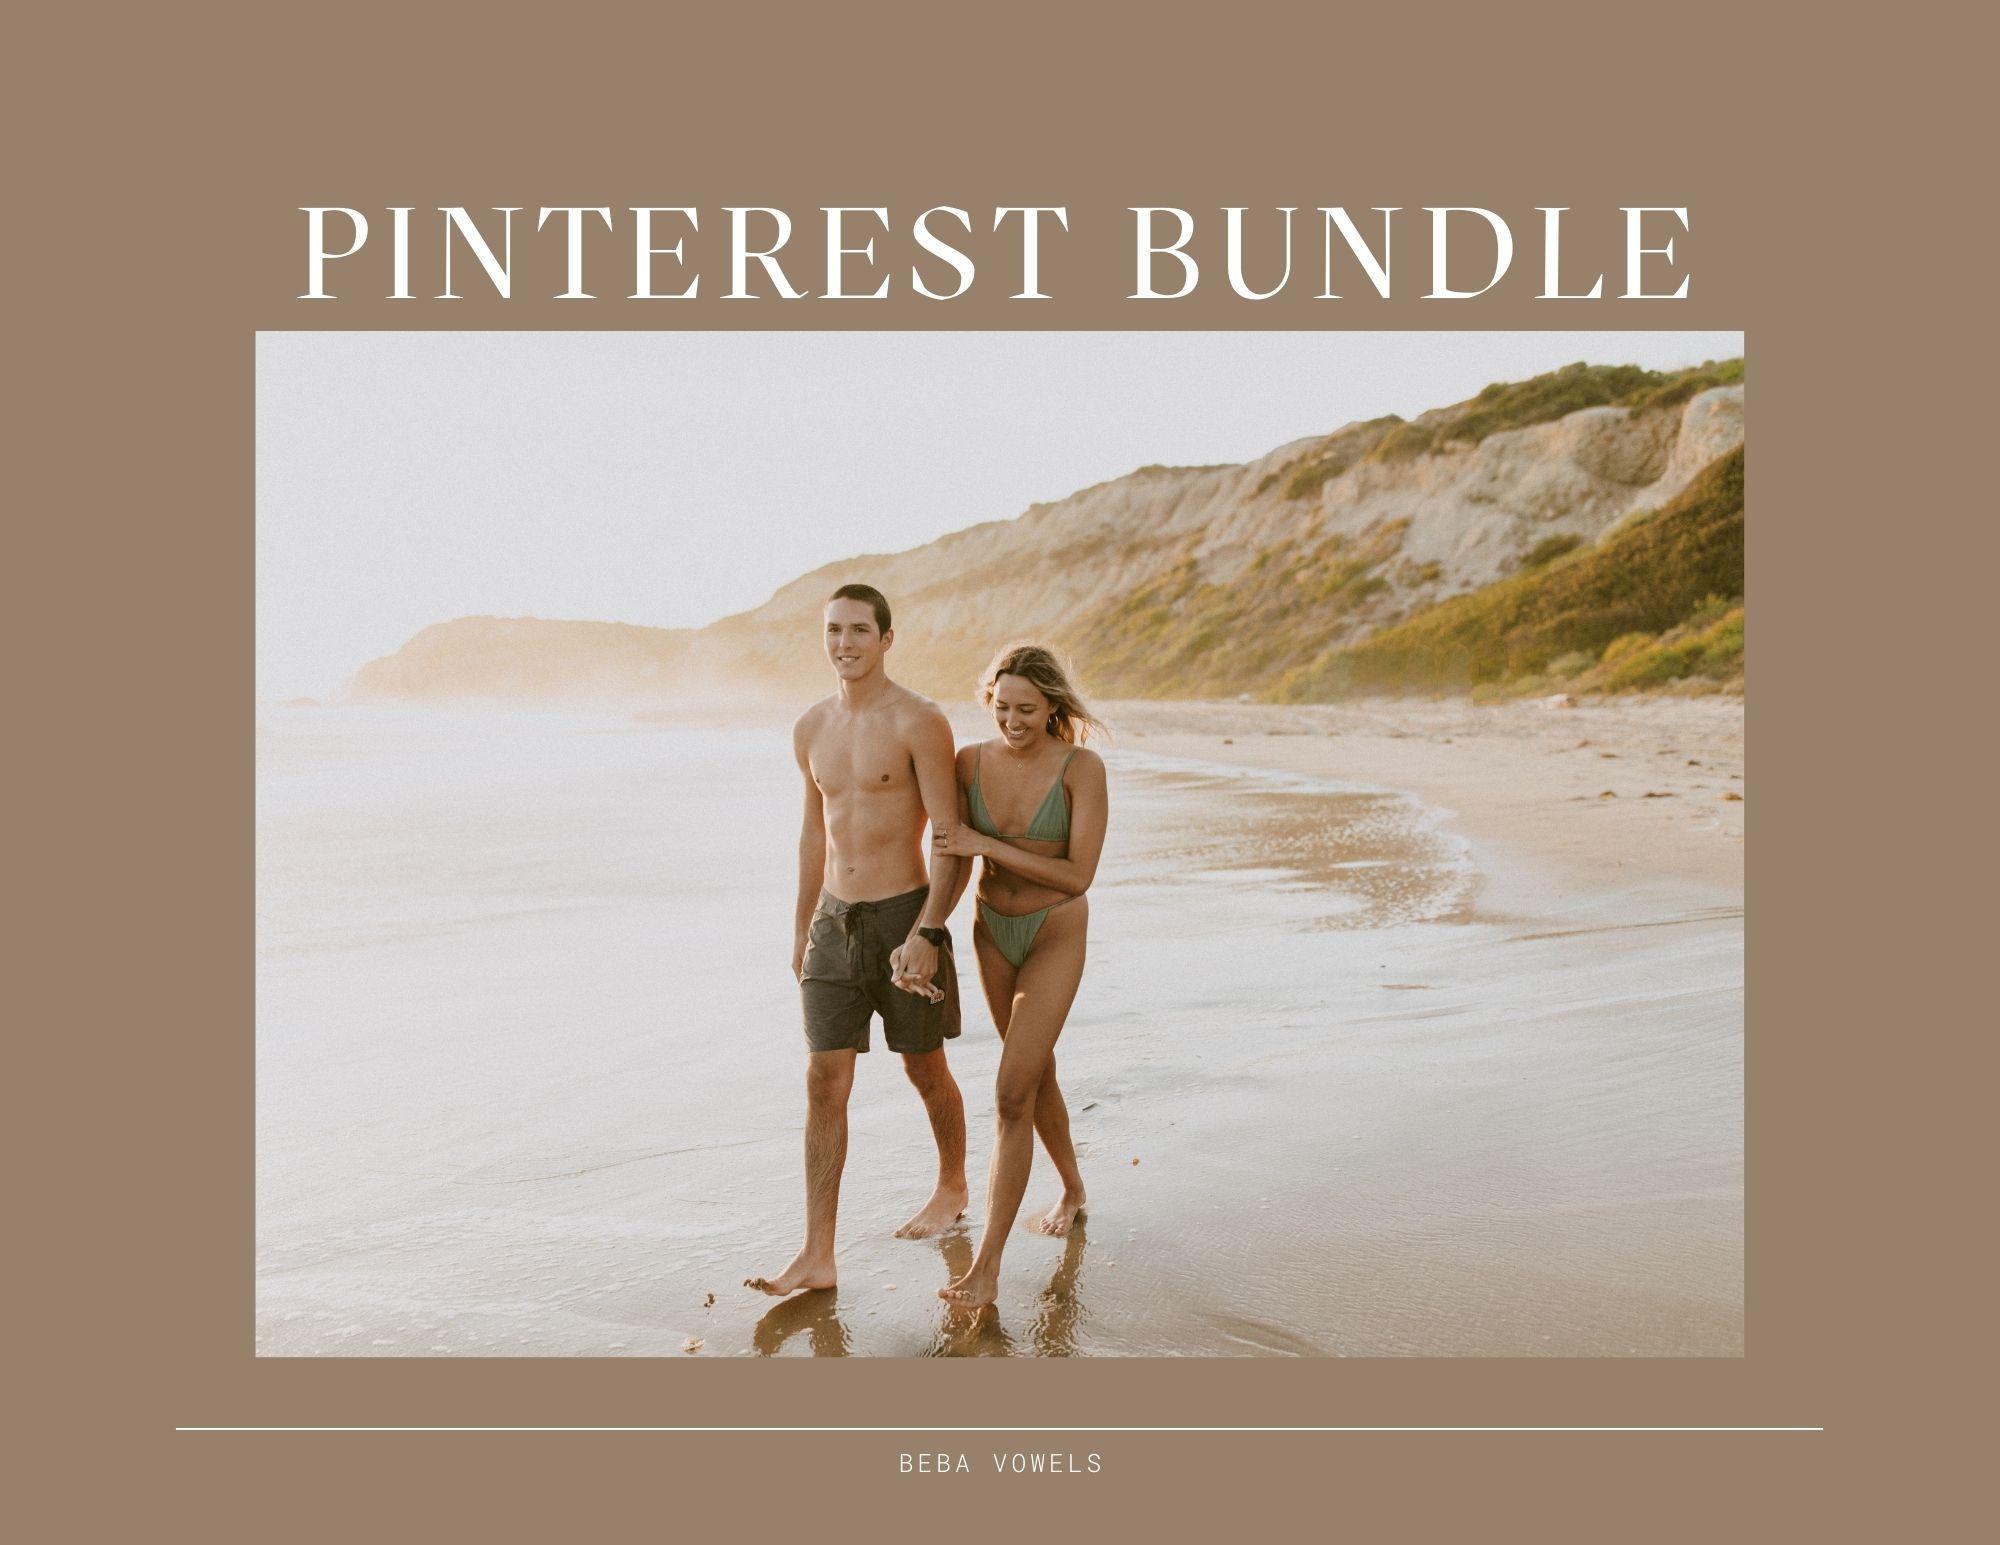 Beba Vowel - Pinterest Guide